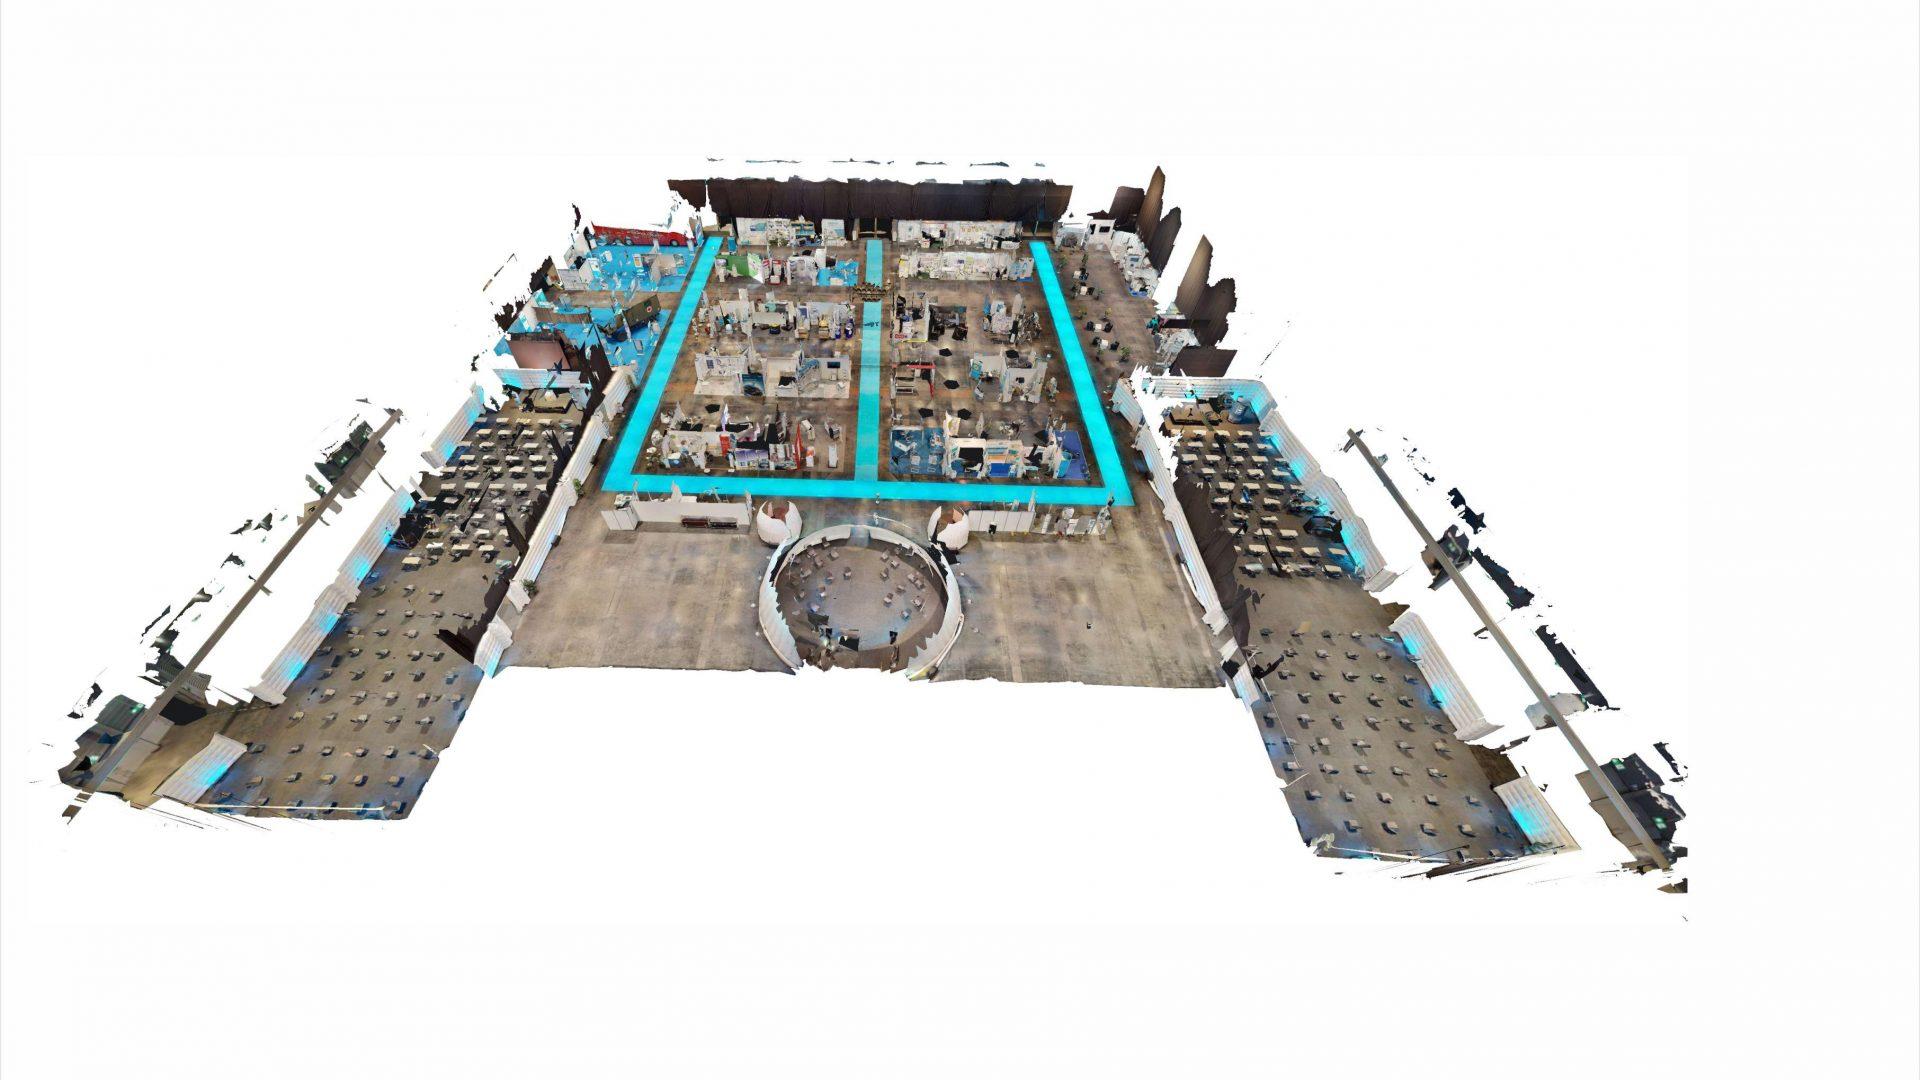 Vitrueller Raum Matterport Digitalisiert Pro Vention